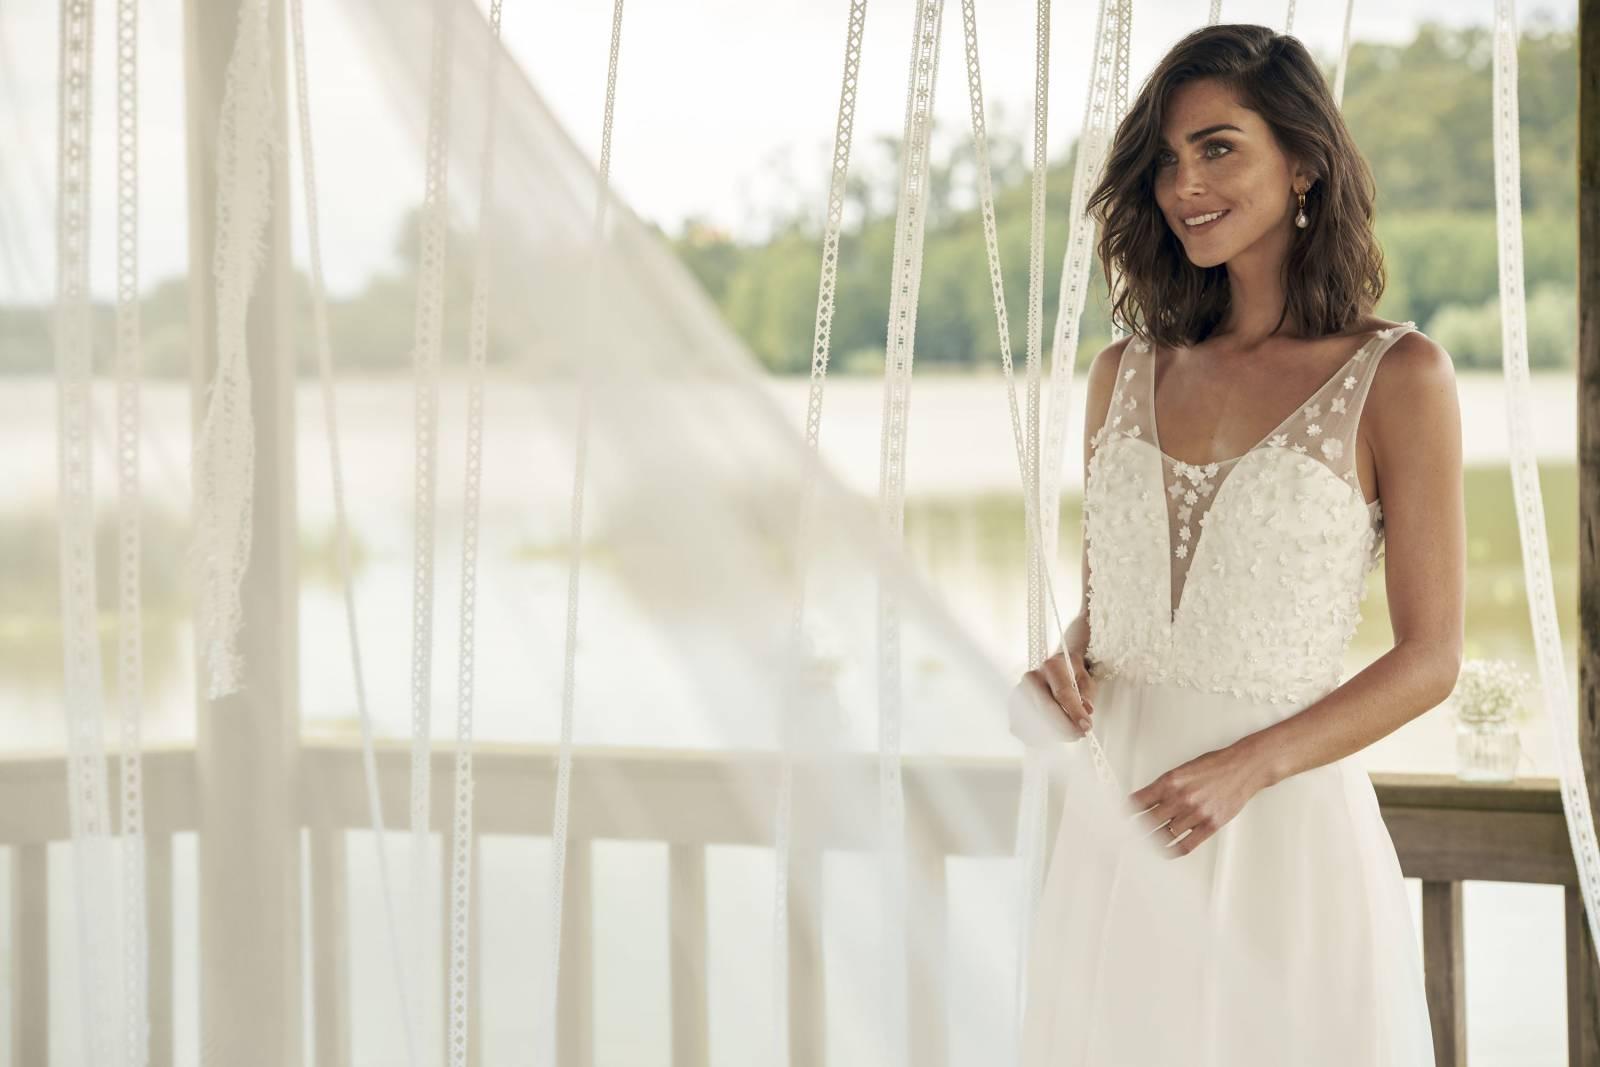 Maxim's Couture - Bruidsmode - Bruidsmodewinkel - Trouwjurk - House of Weddings - 18